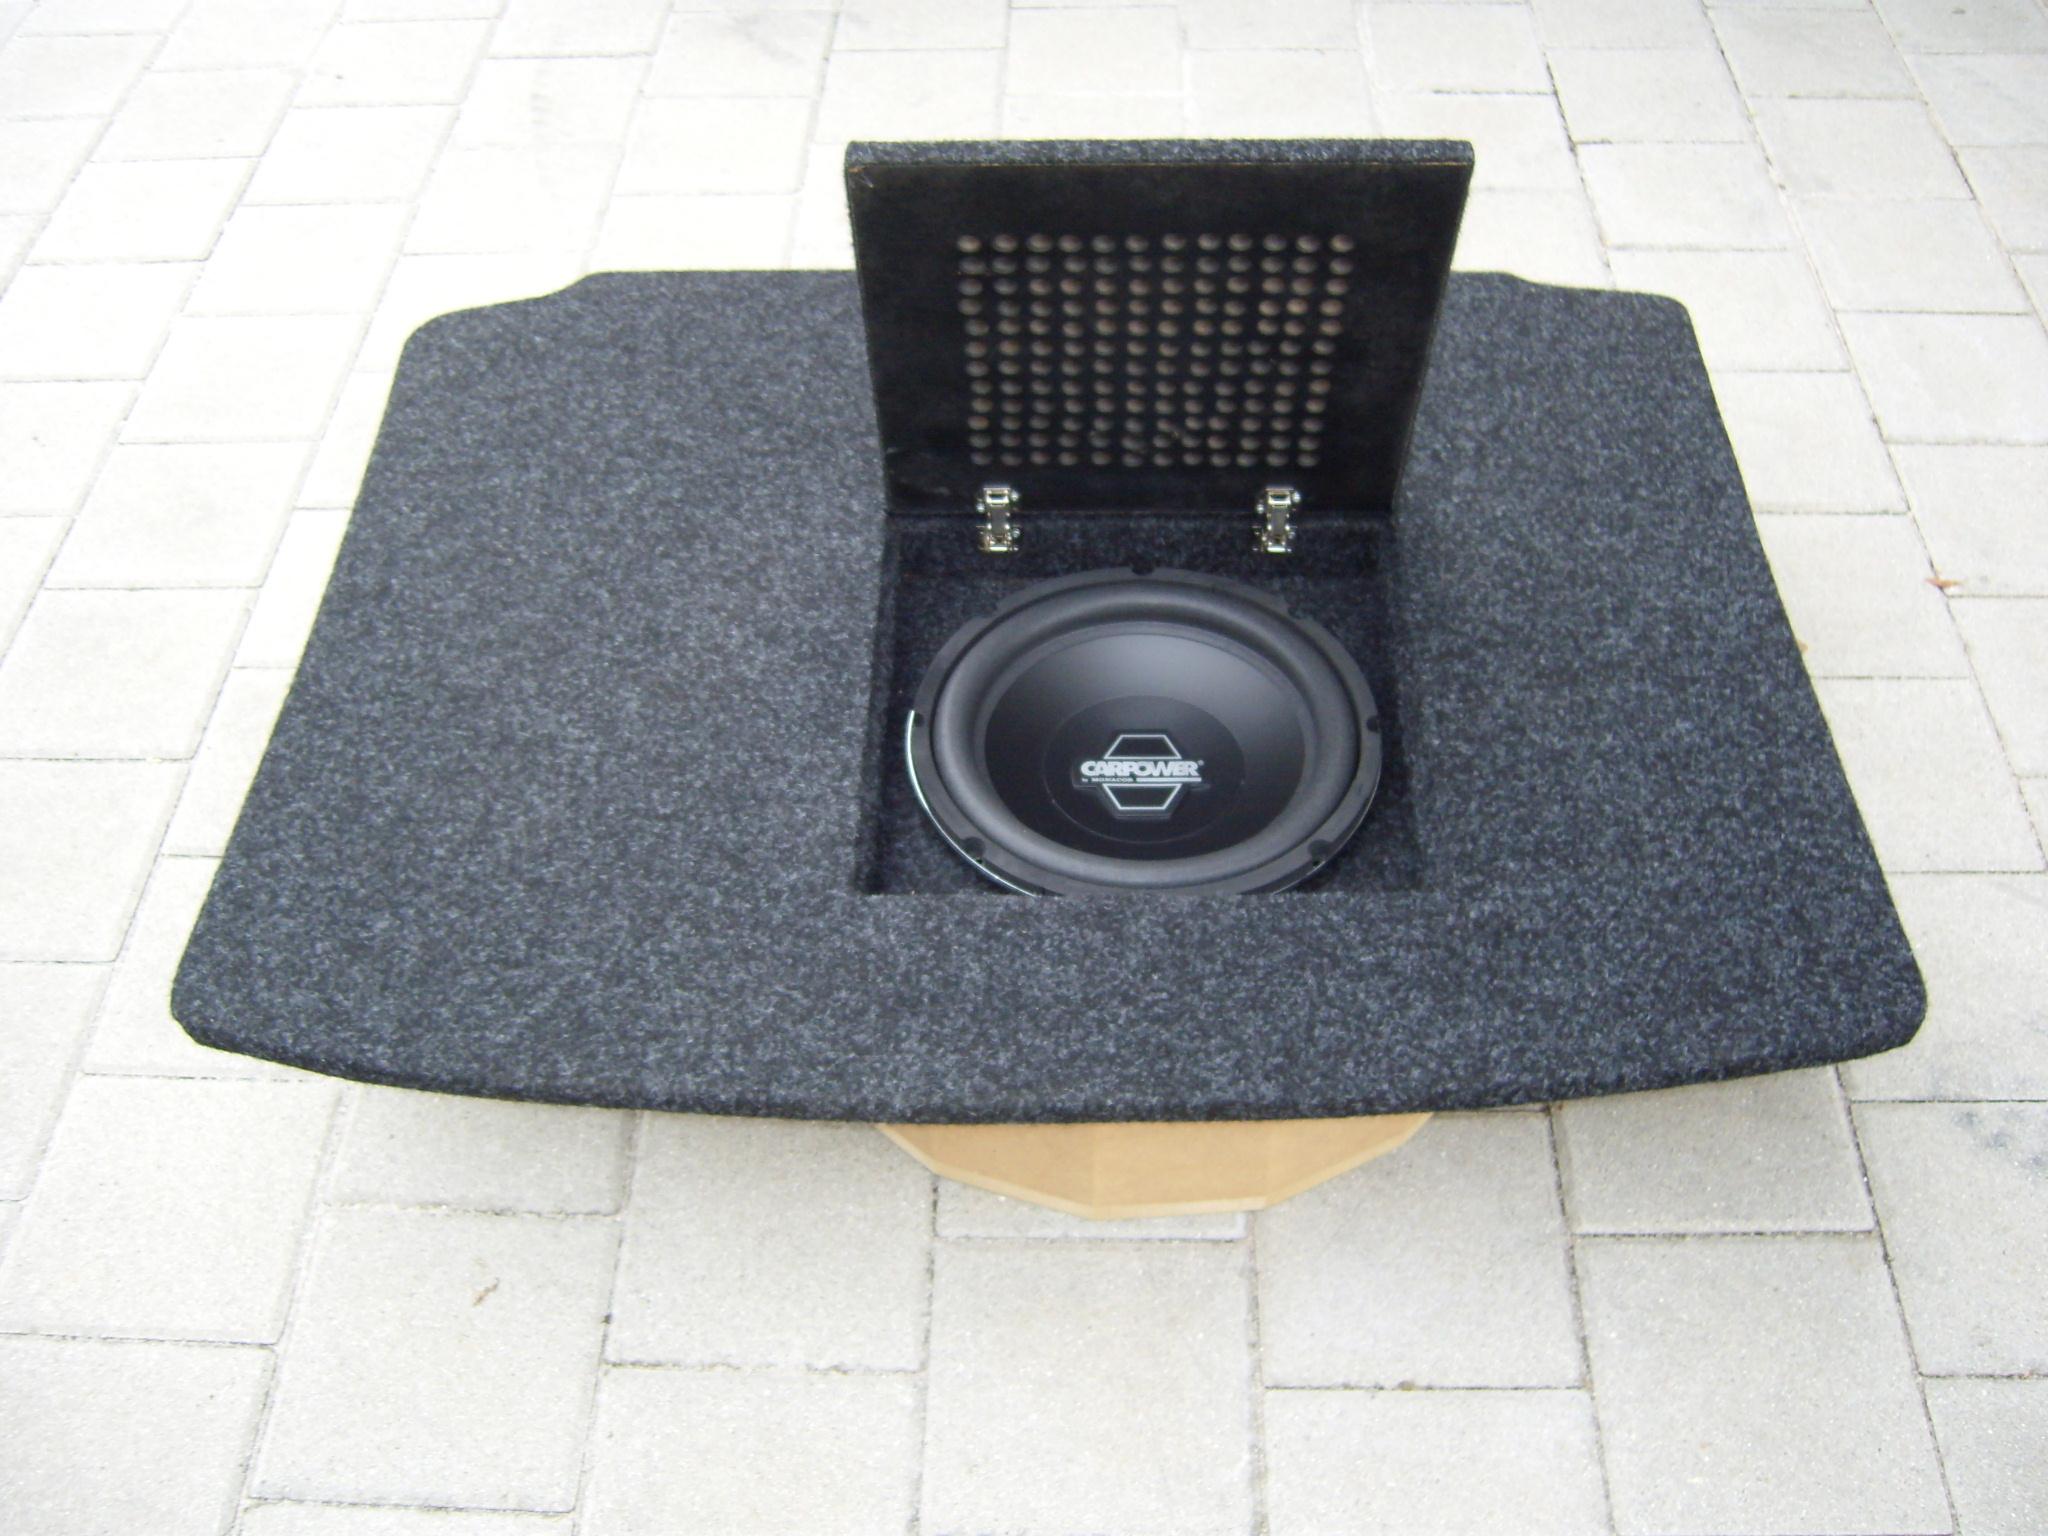 komplettausbau kofferraumausbau golf 5 inkl ground zero. Black Bedroom Furniture Sets. Home Design Ideas